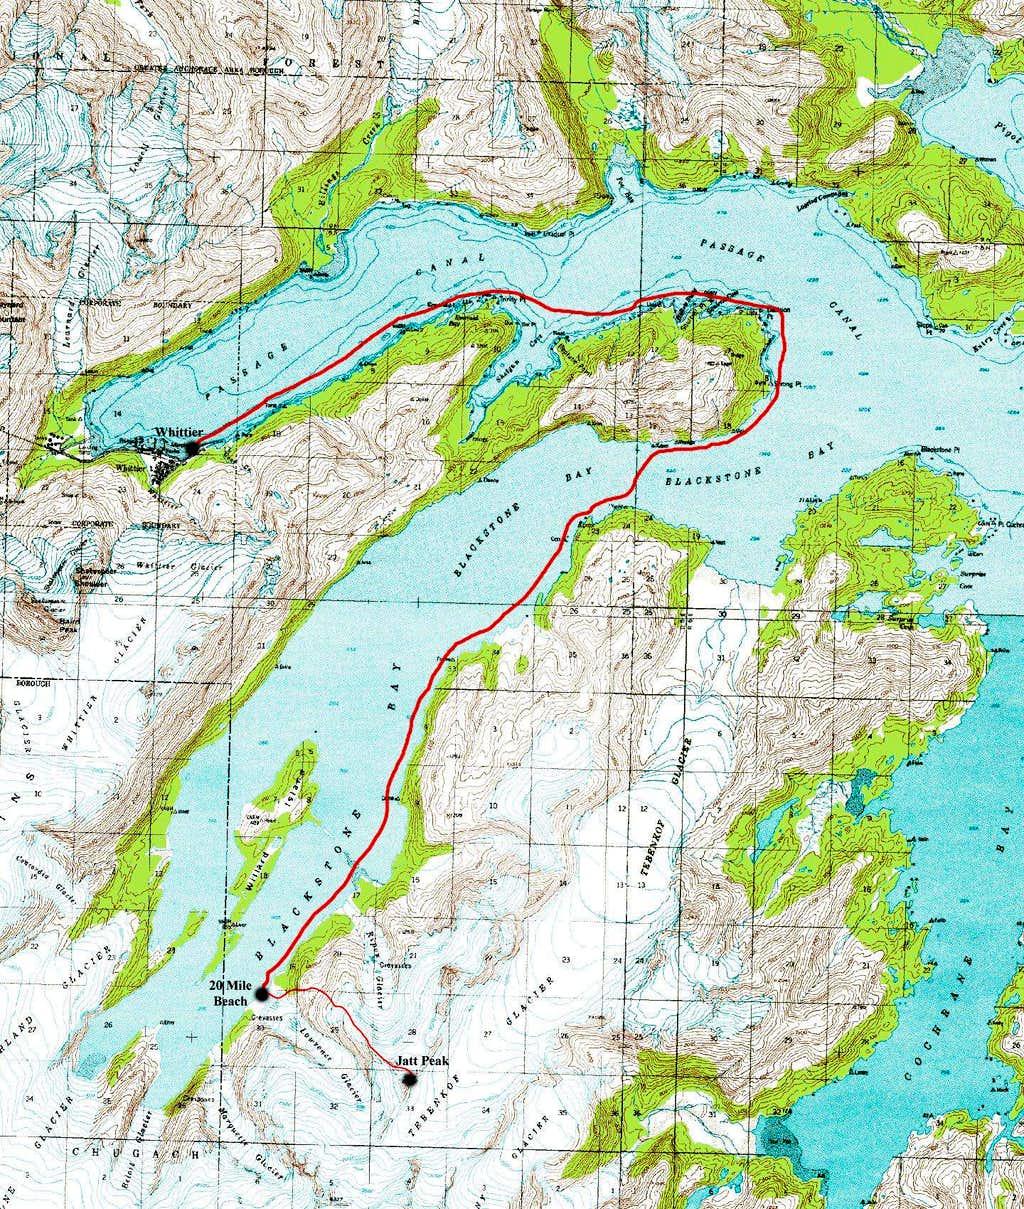 Blackstone Bay and Jatt Peak Topo Map